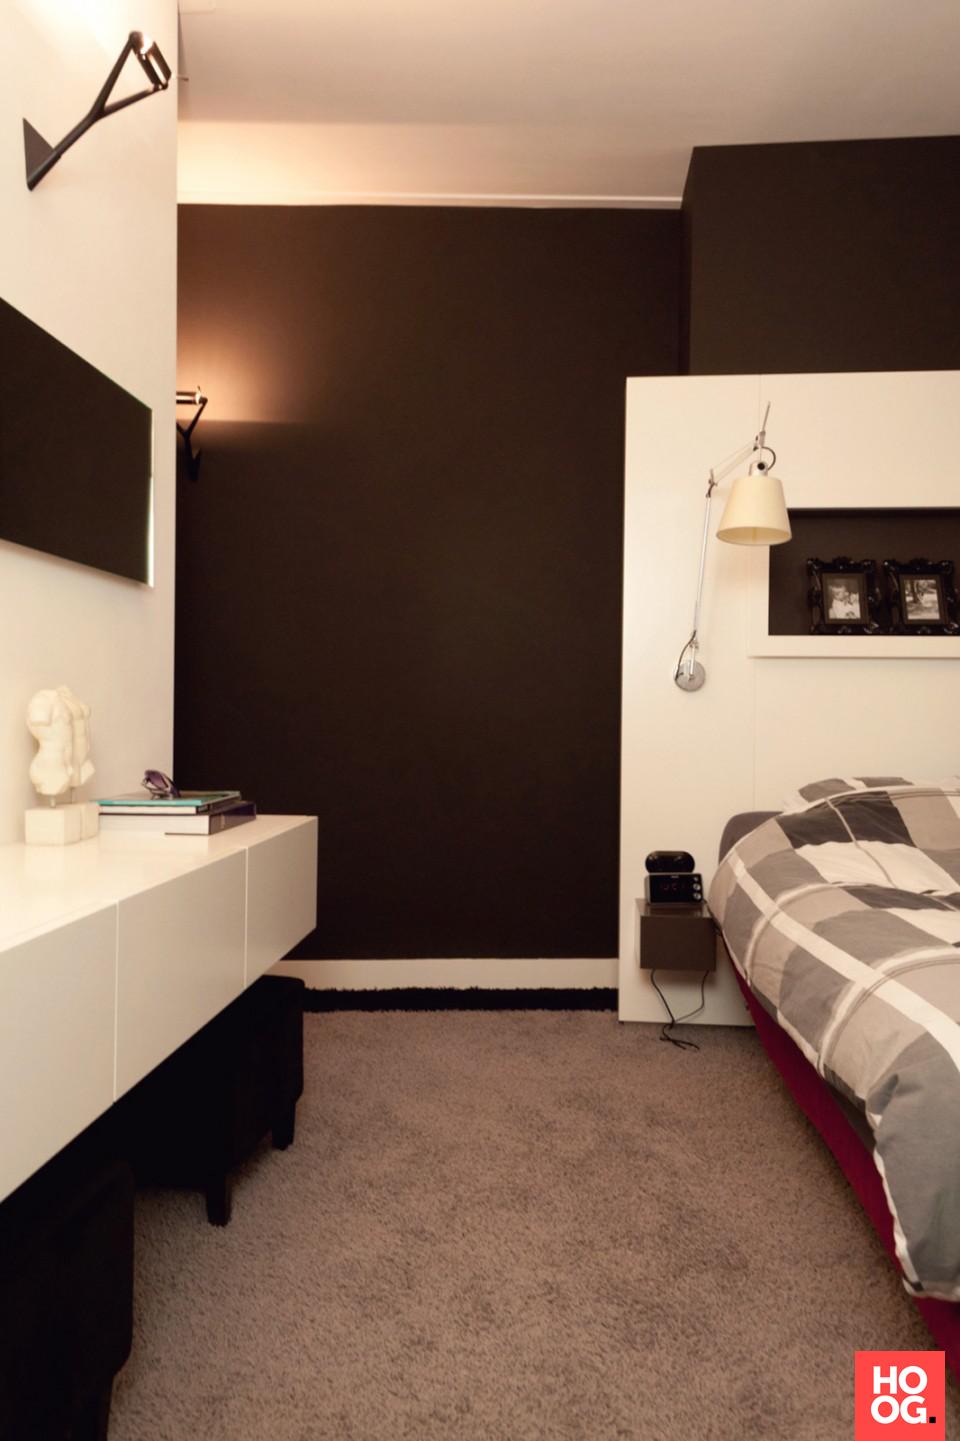 Moderne slaapkamer met vloerbedekking | slaapkamer design | bedroom ...